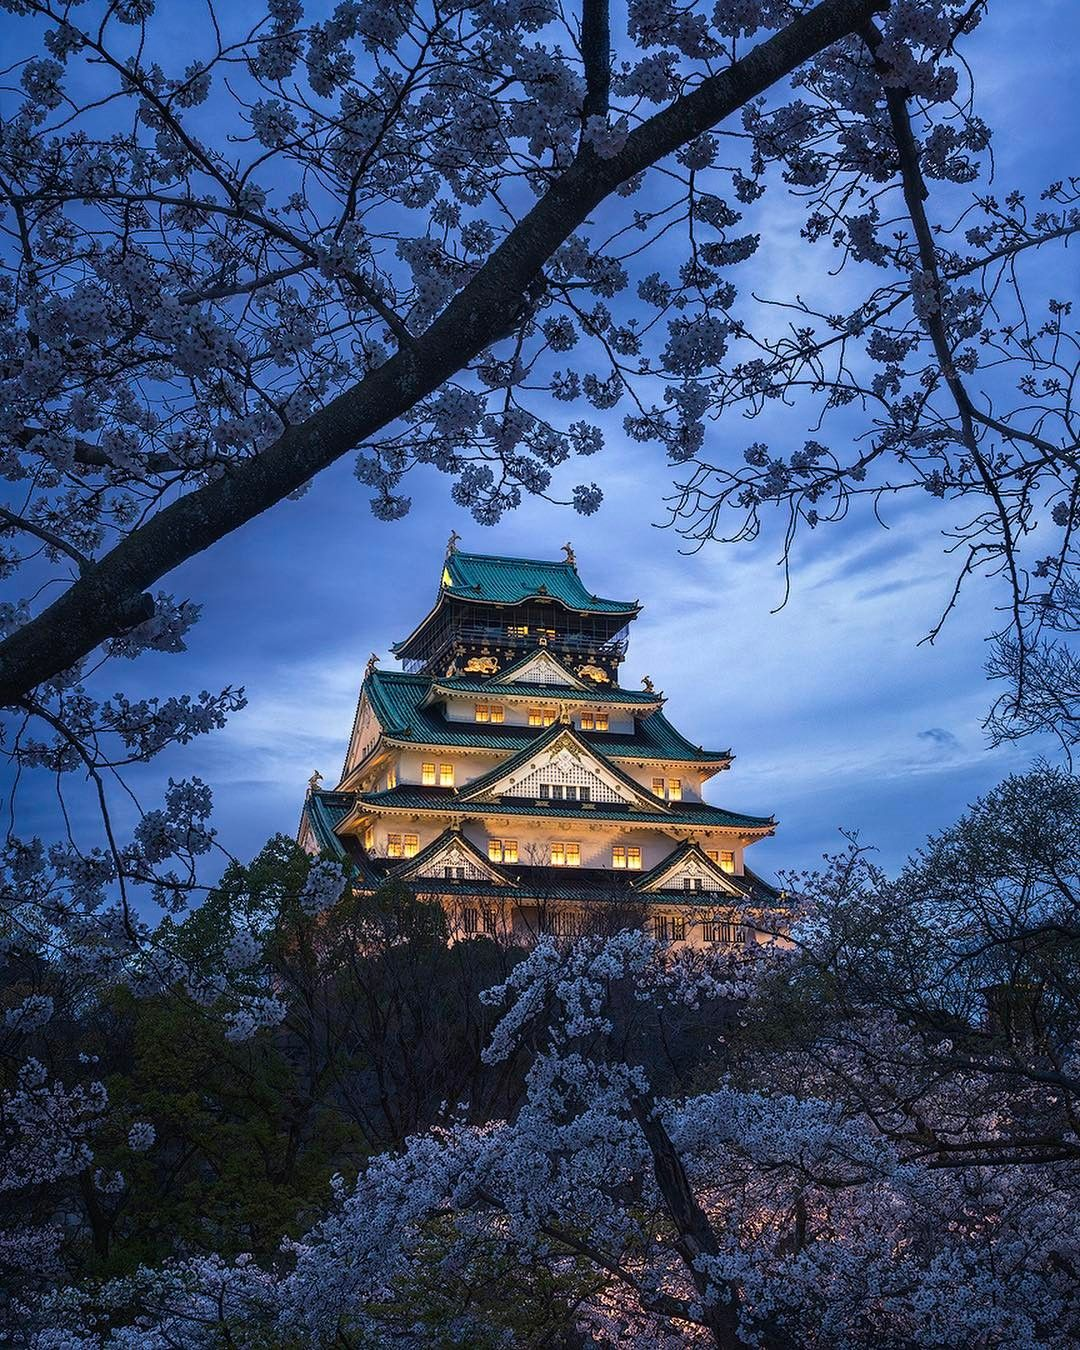 Osaka Castle, Osaka, Japan, 大阪城, 大阪, 日本, #sakura #cherryblossom 桜  www.travel4life.club